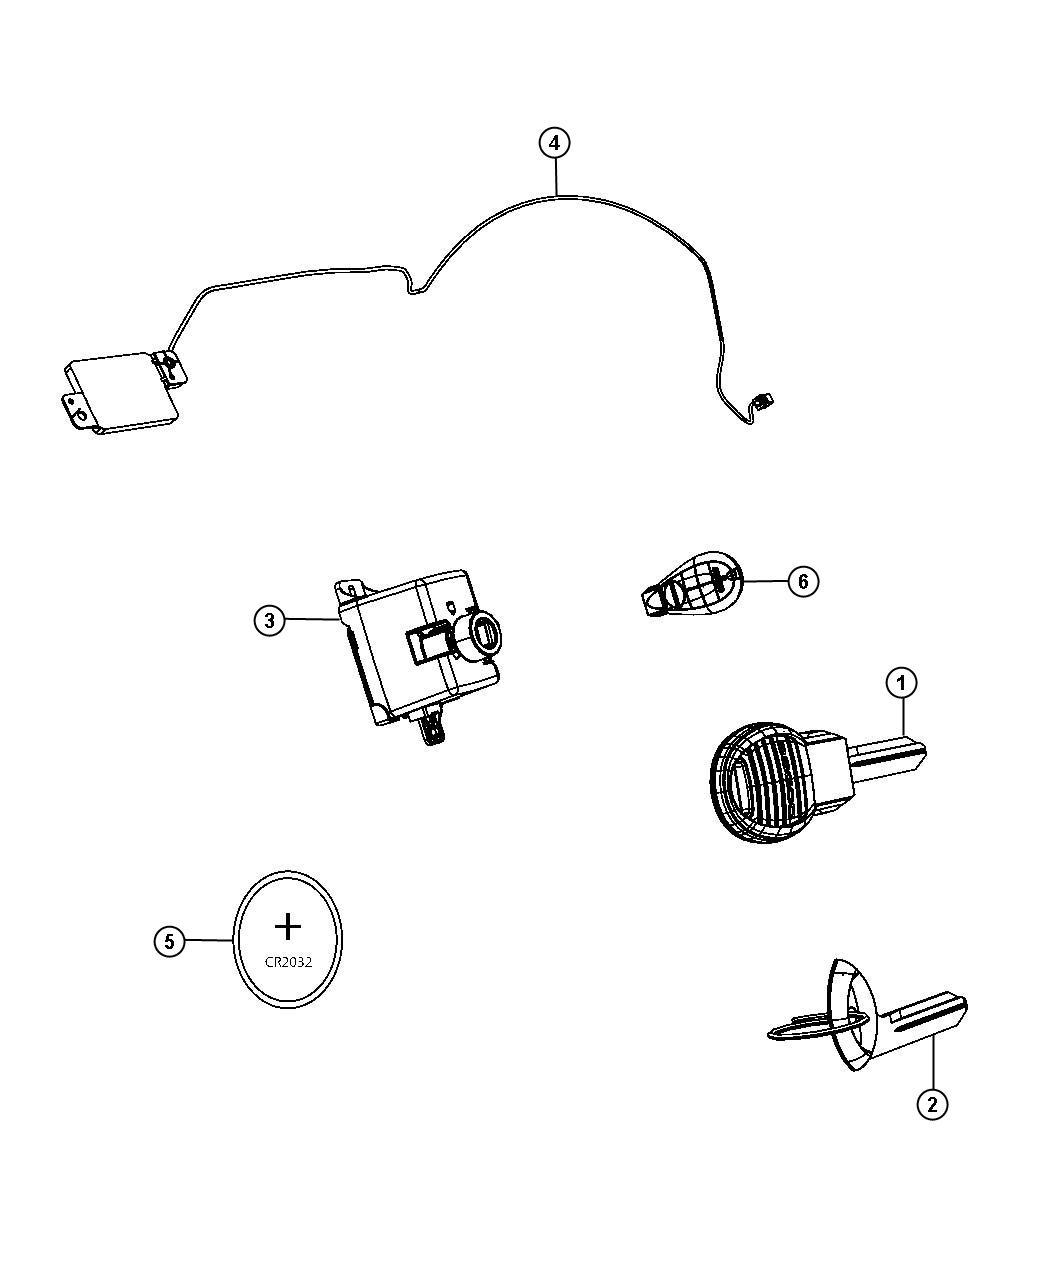 Ram Transmitter Integrated Key Fob